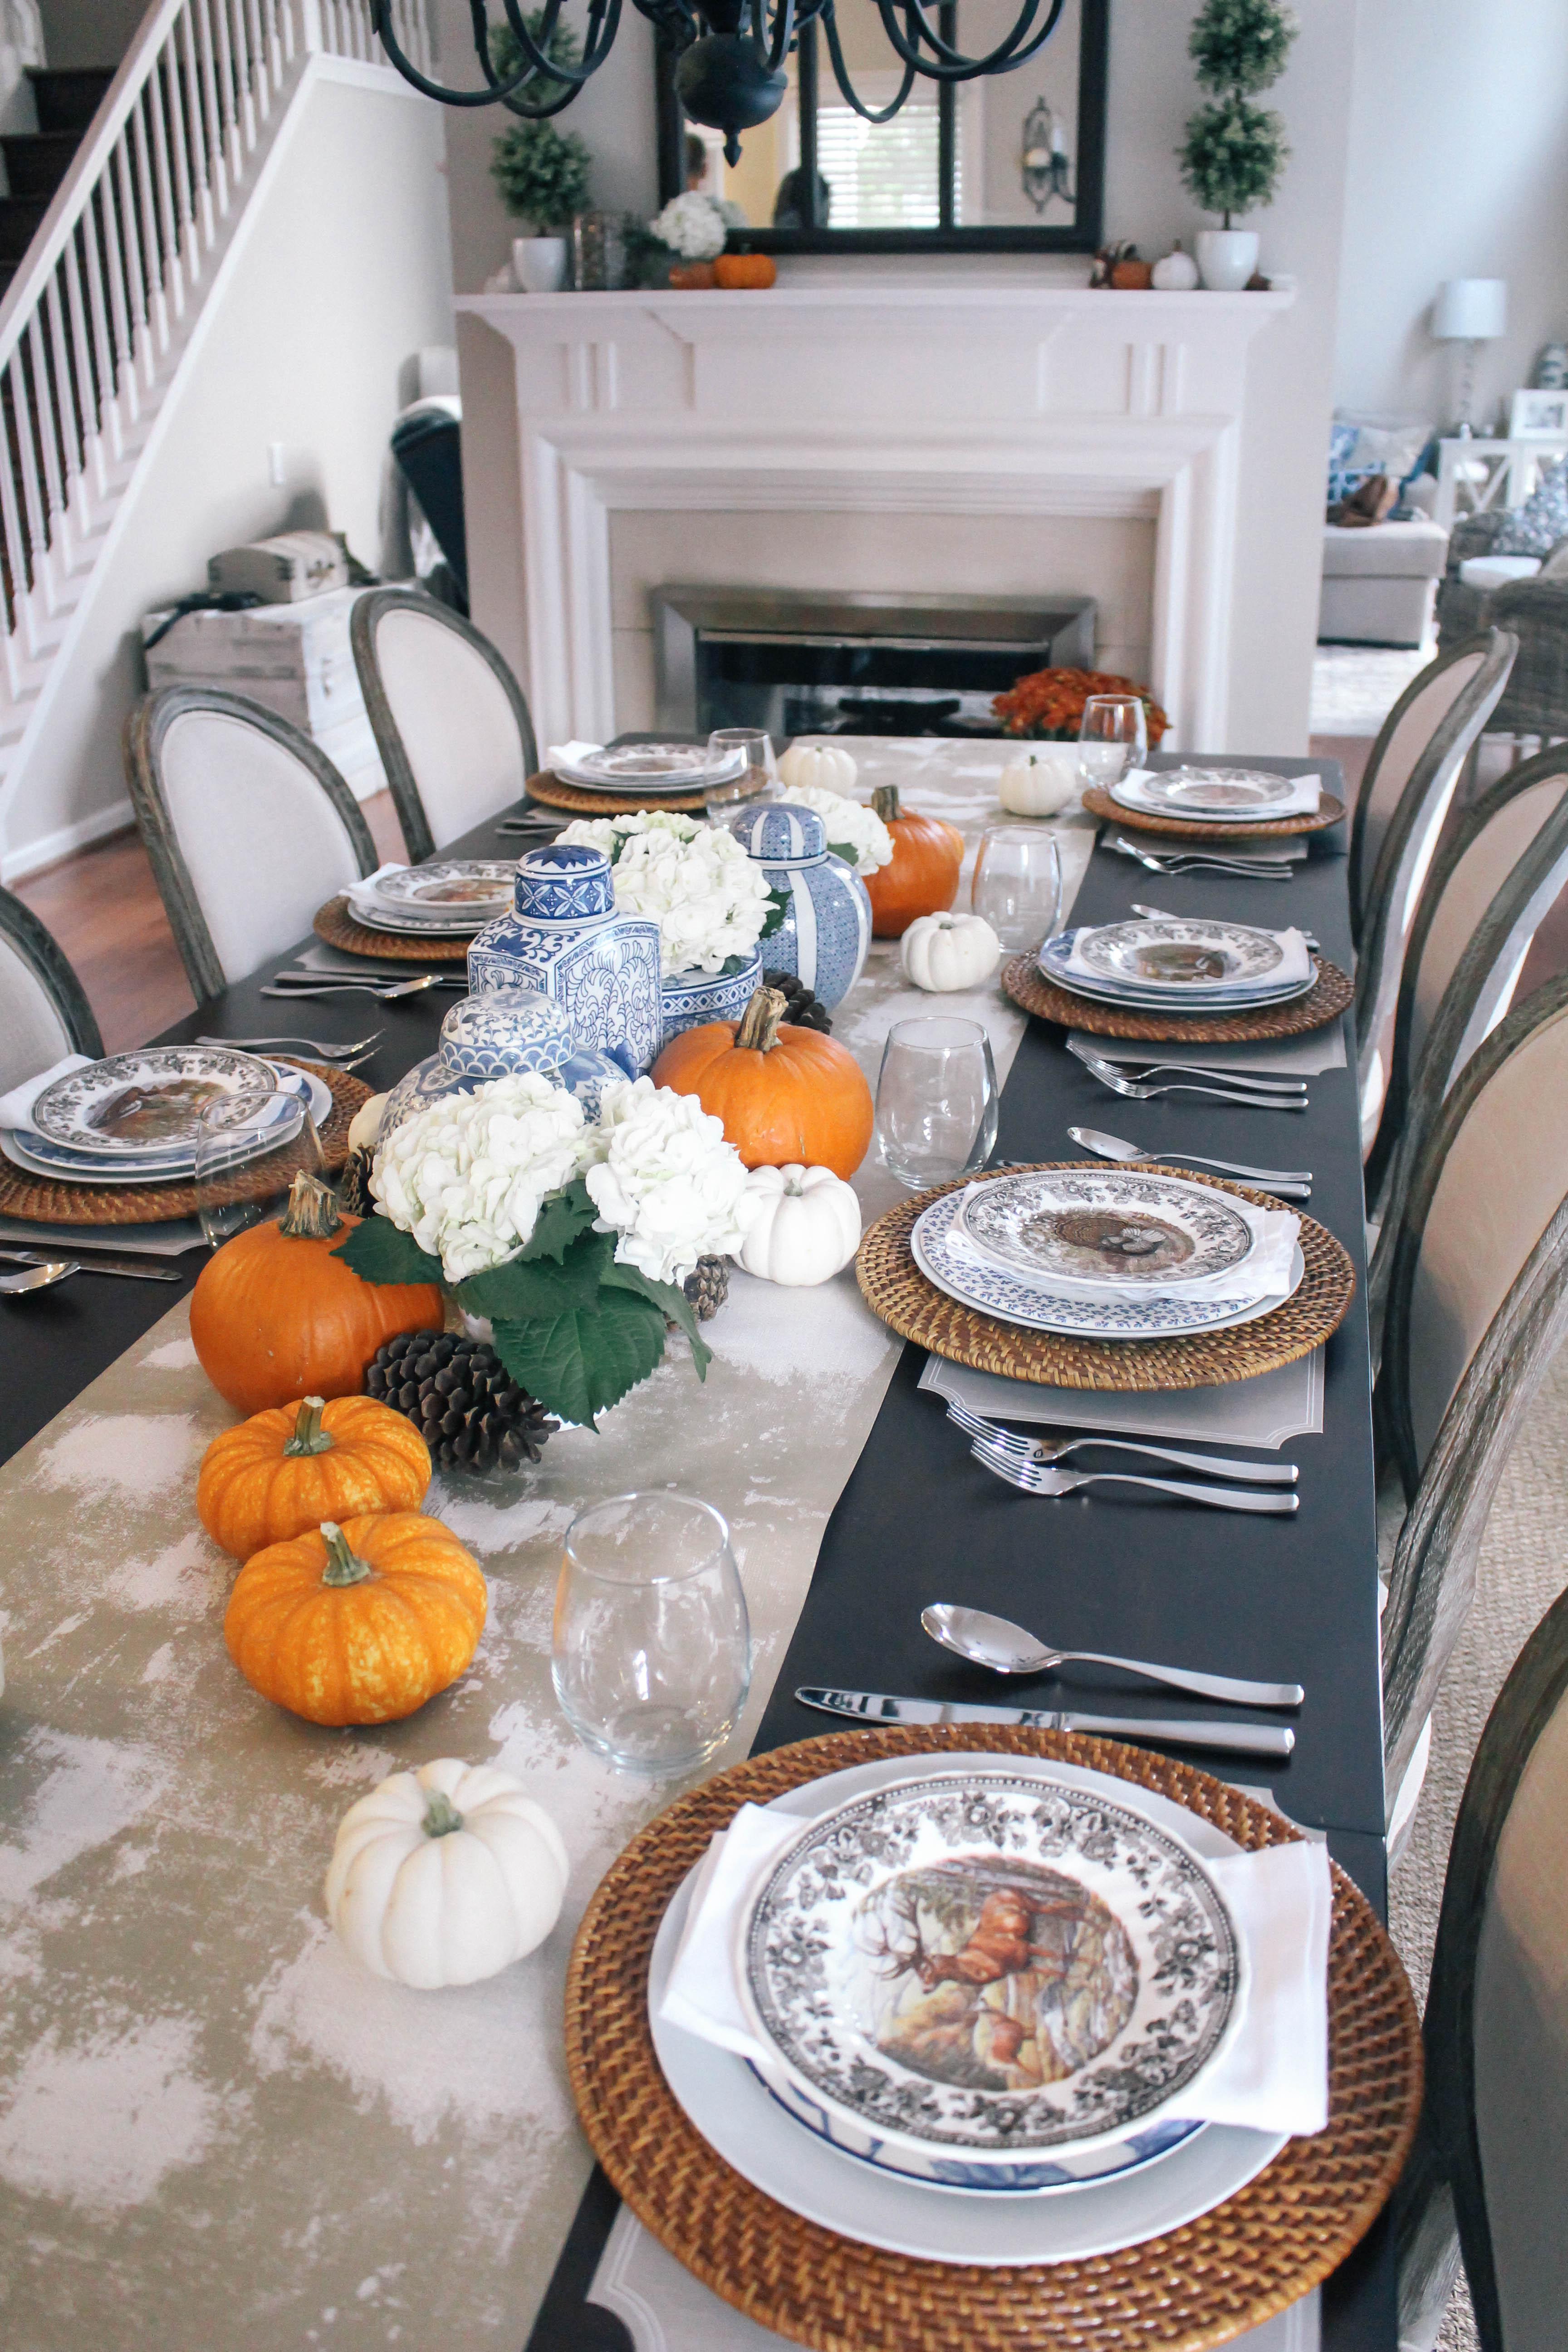 Thanksgiving-Tablescape-Ginger-Jars-Pumpkins-Blue-White-Orange-Animal-Game-Plate-China-4